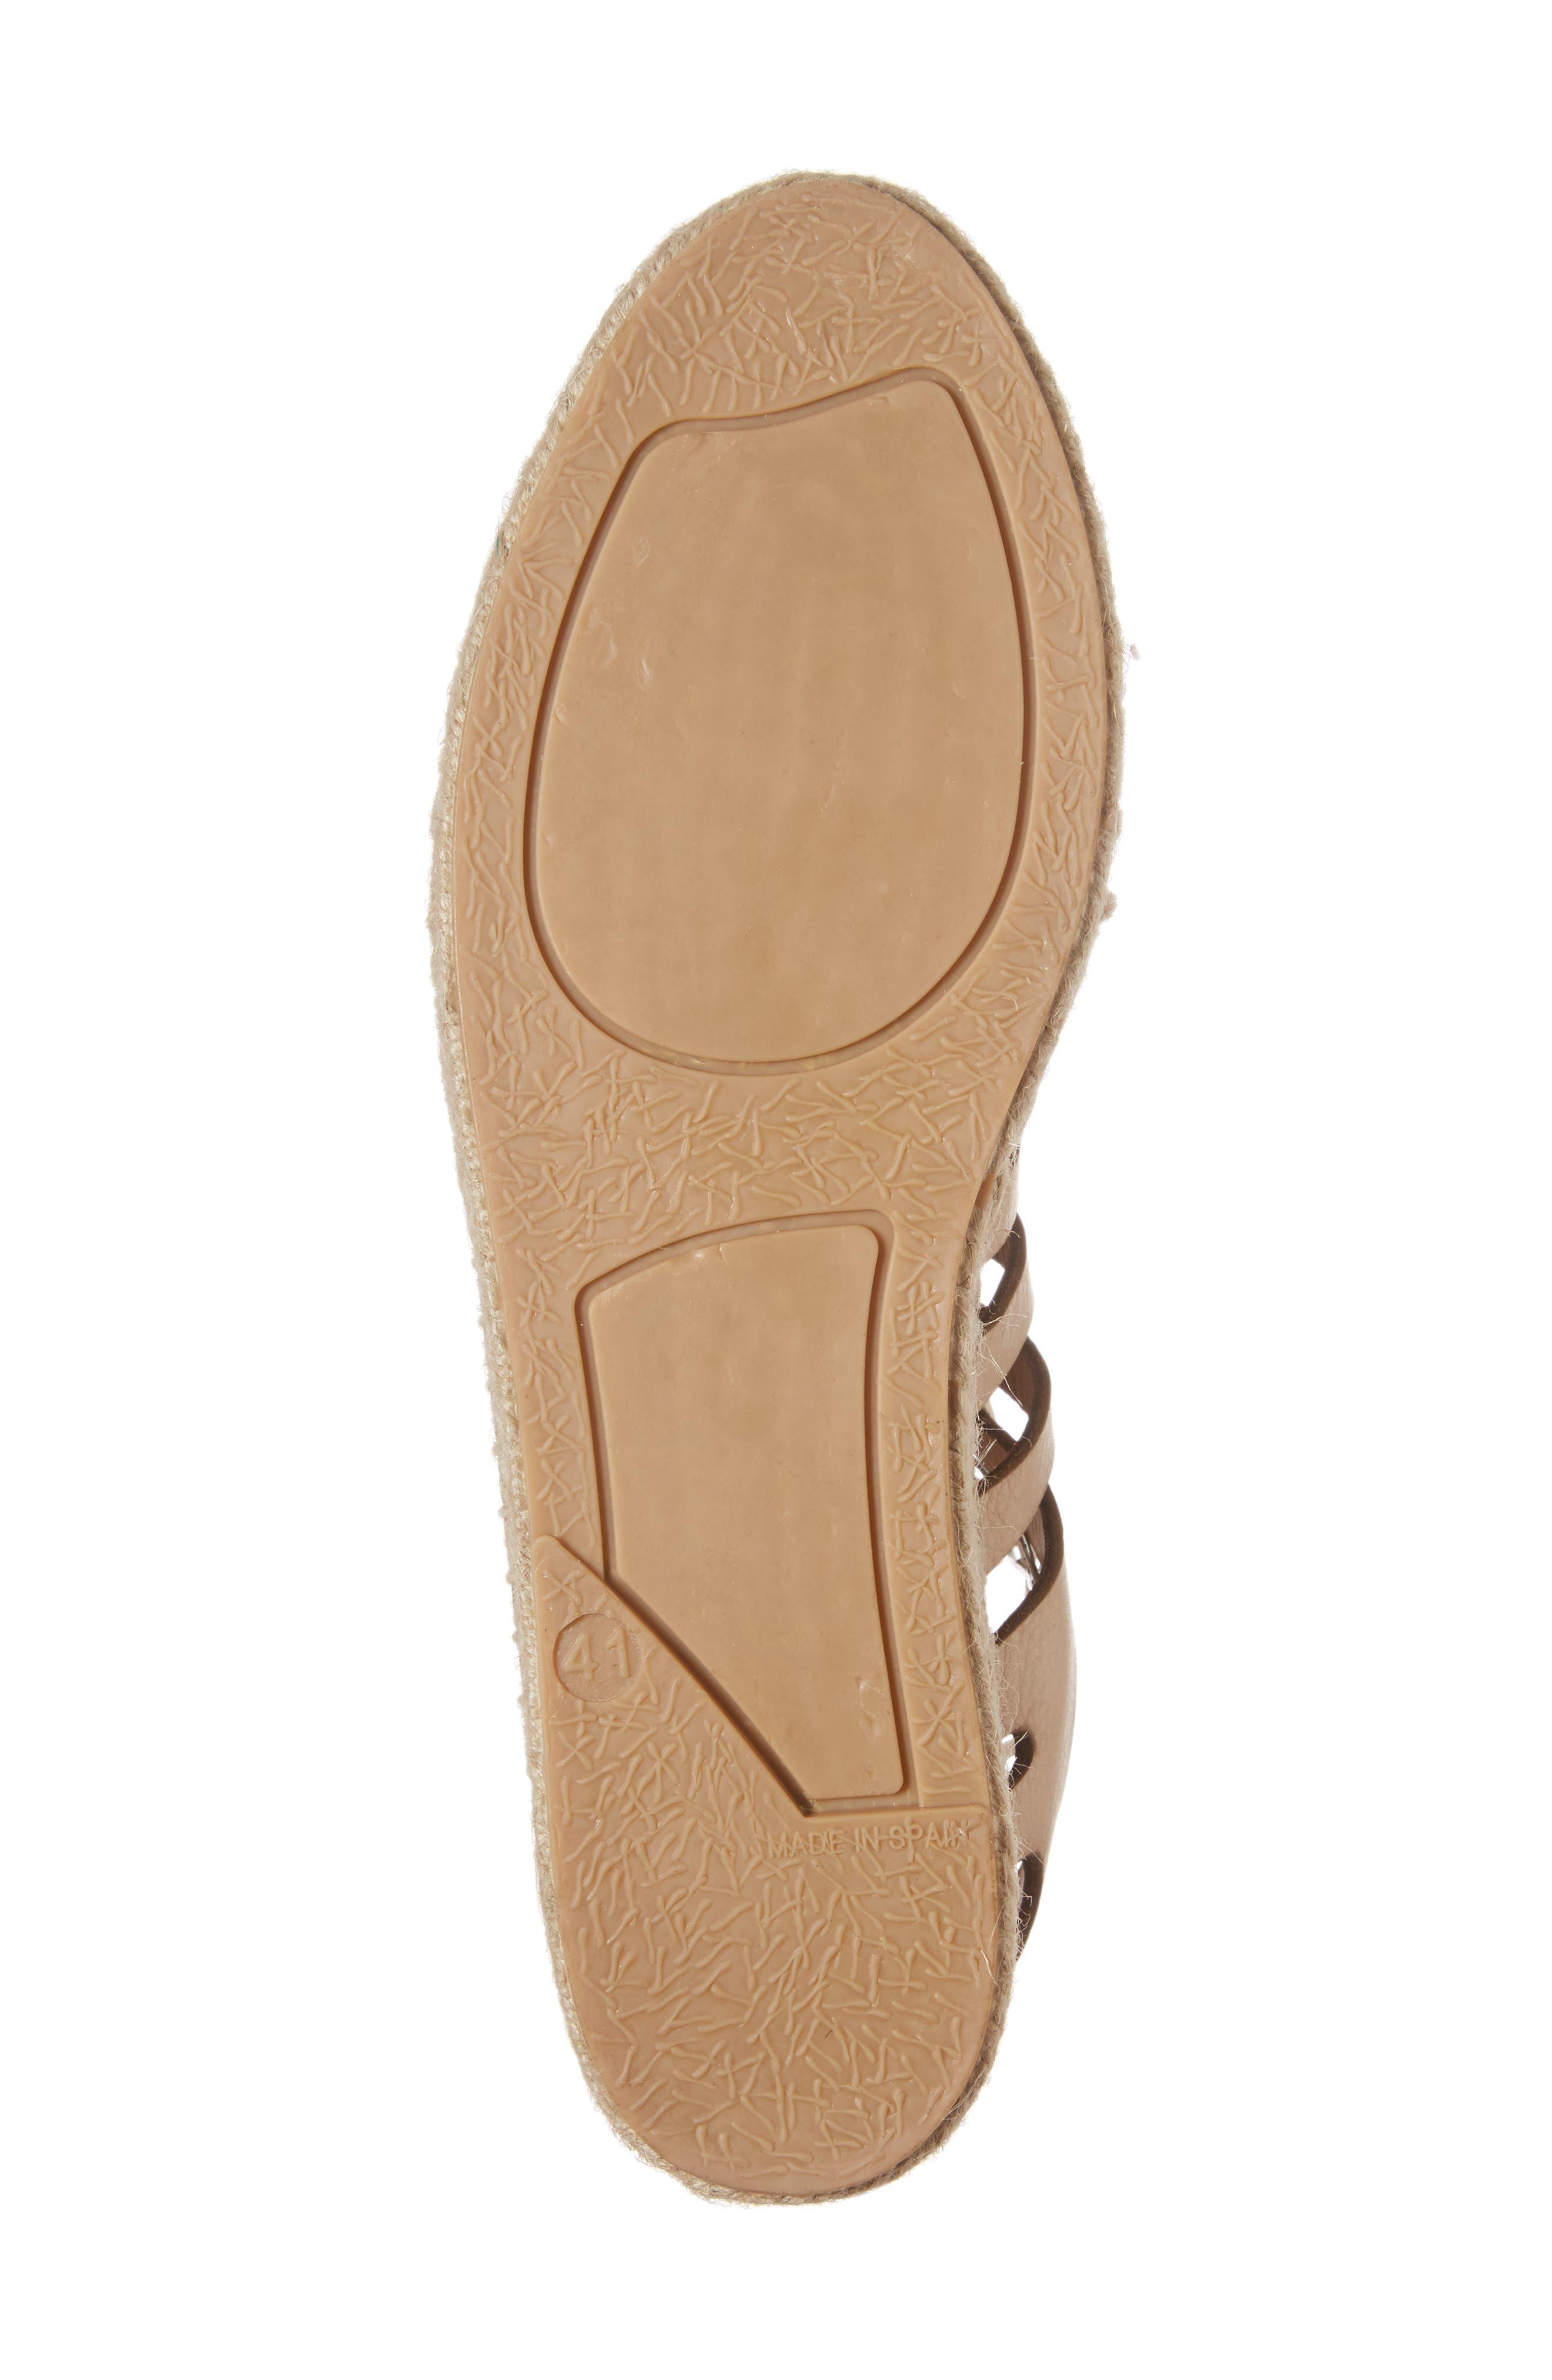 Krown Wraparound Platform Sandal,                             Alternate thumbnail 12, color,